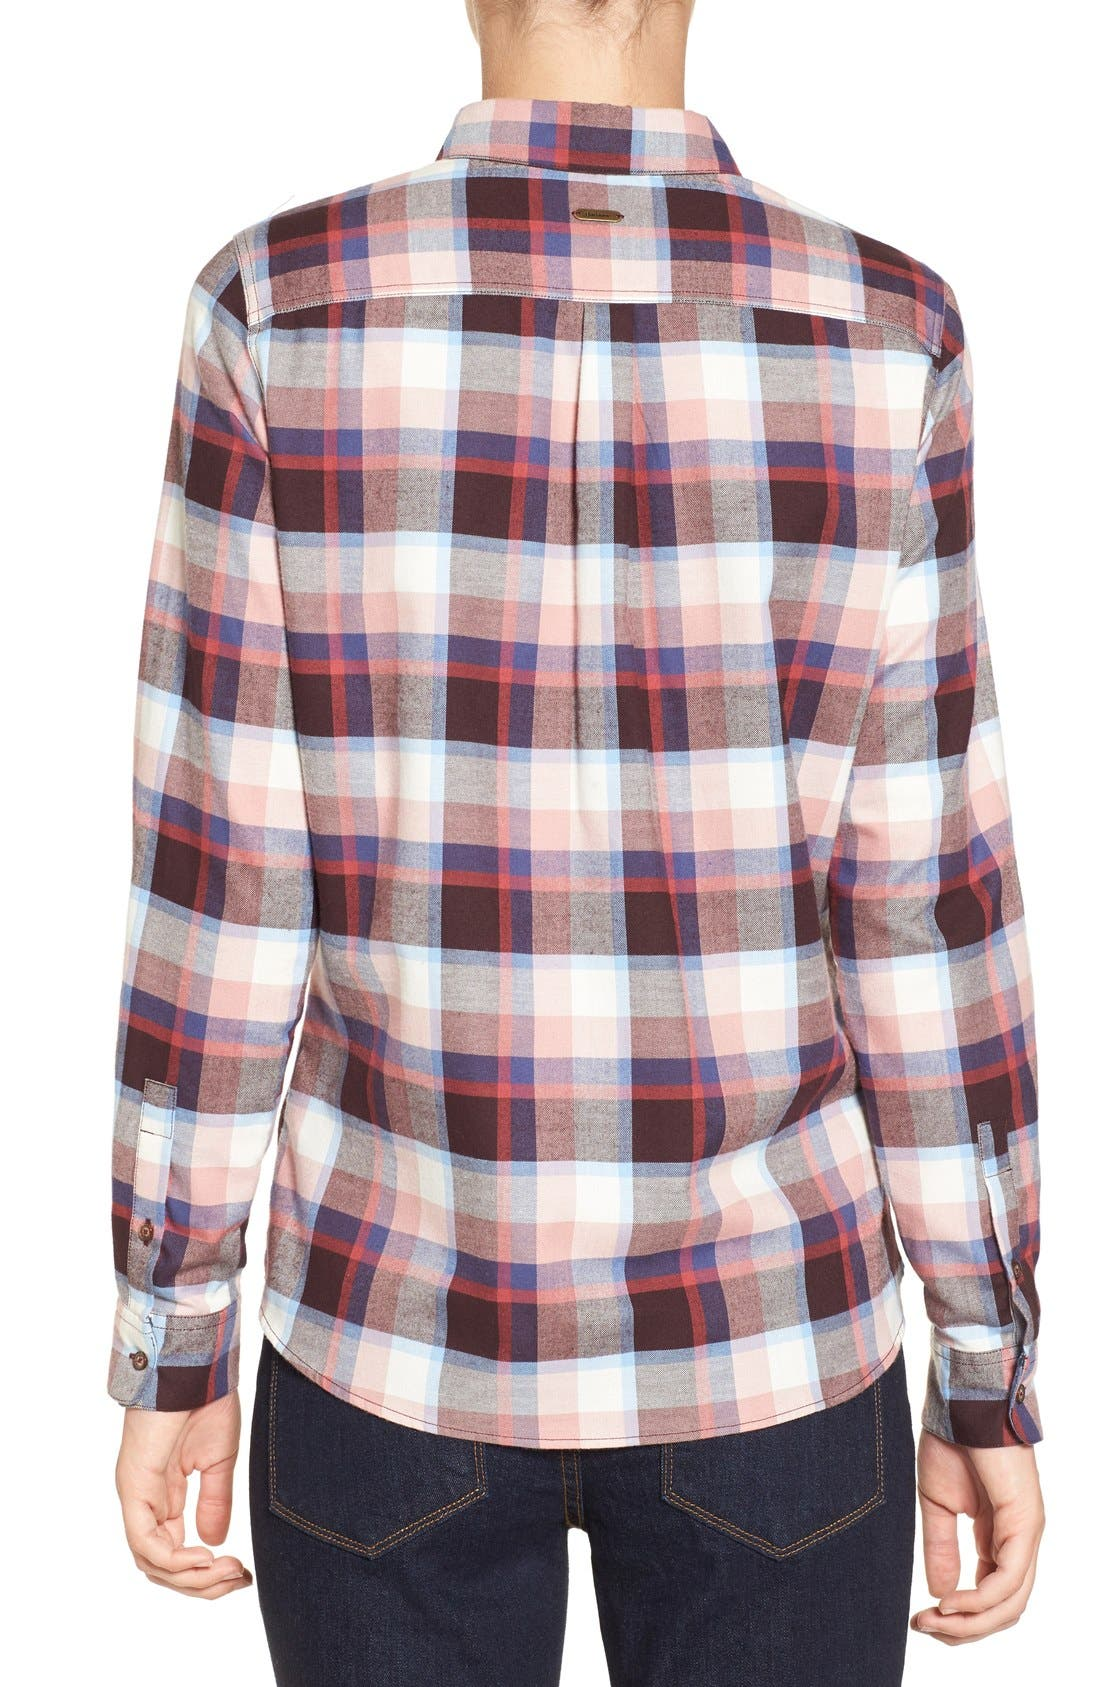 'Darwen' Plaid Shirt,                             Alternate thumbnail 2, color,                             Pink Check